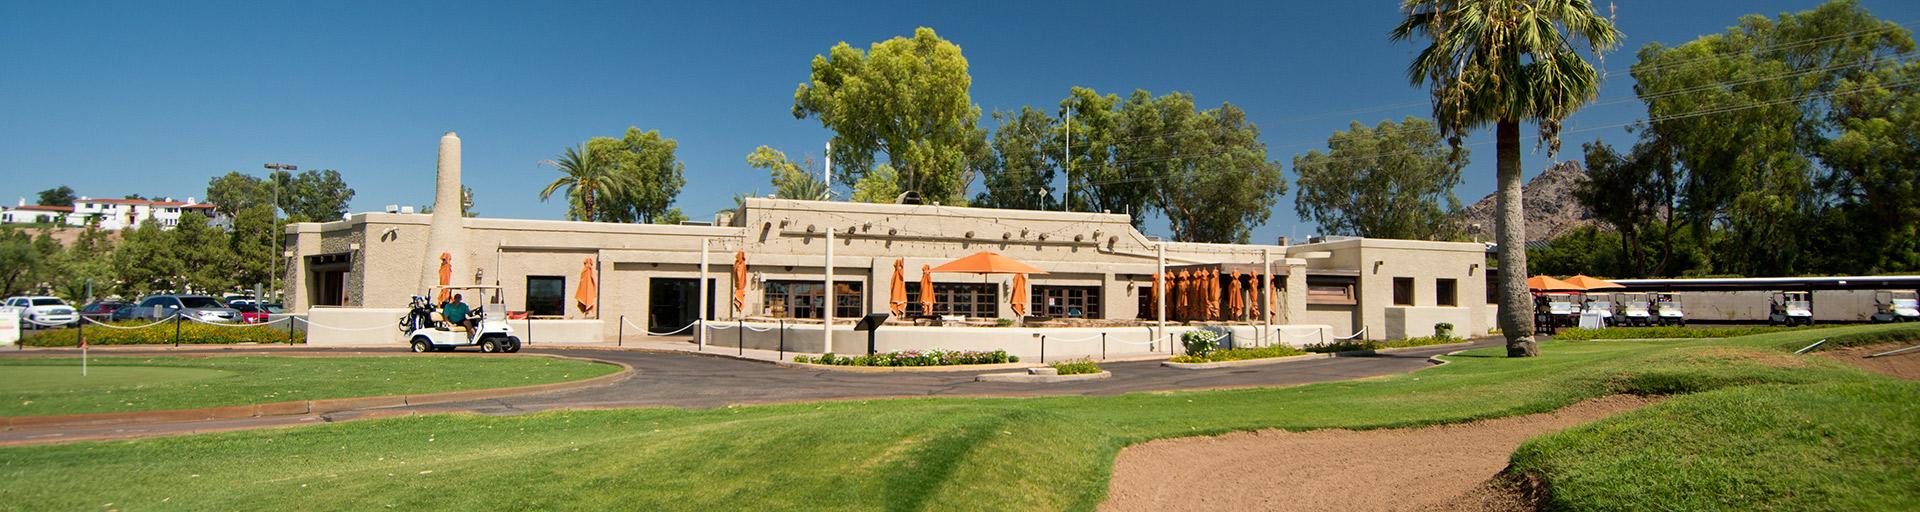 The Adobe Restaurant in Phoenix, Arizona